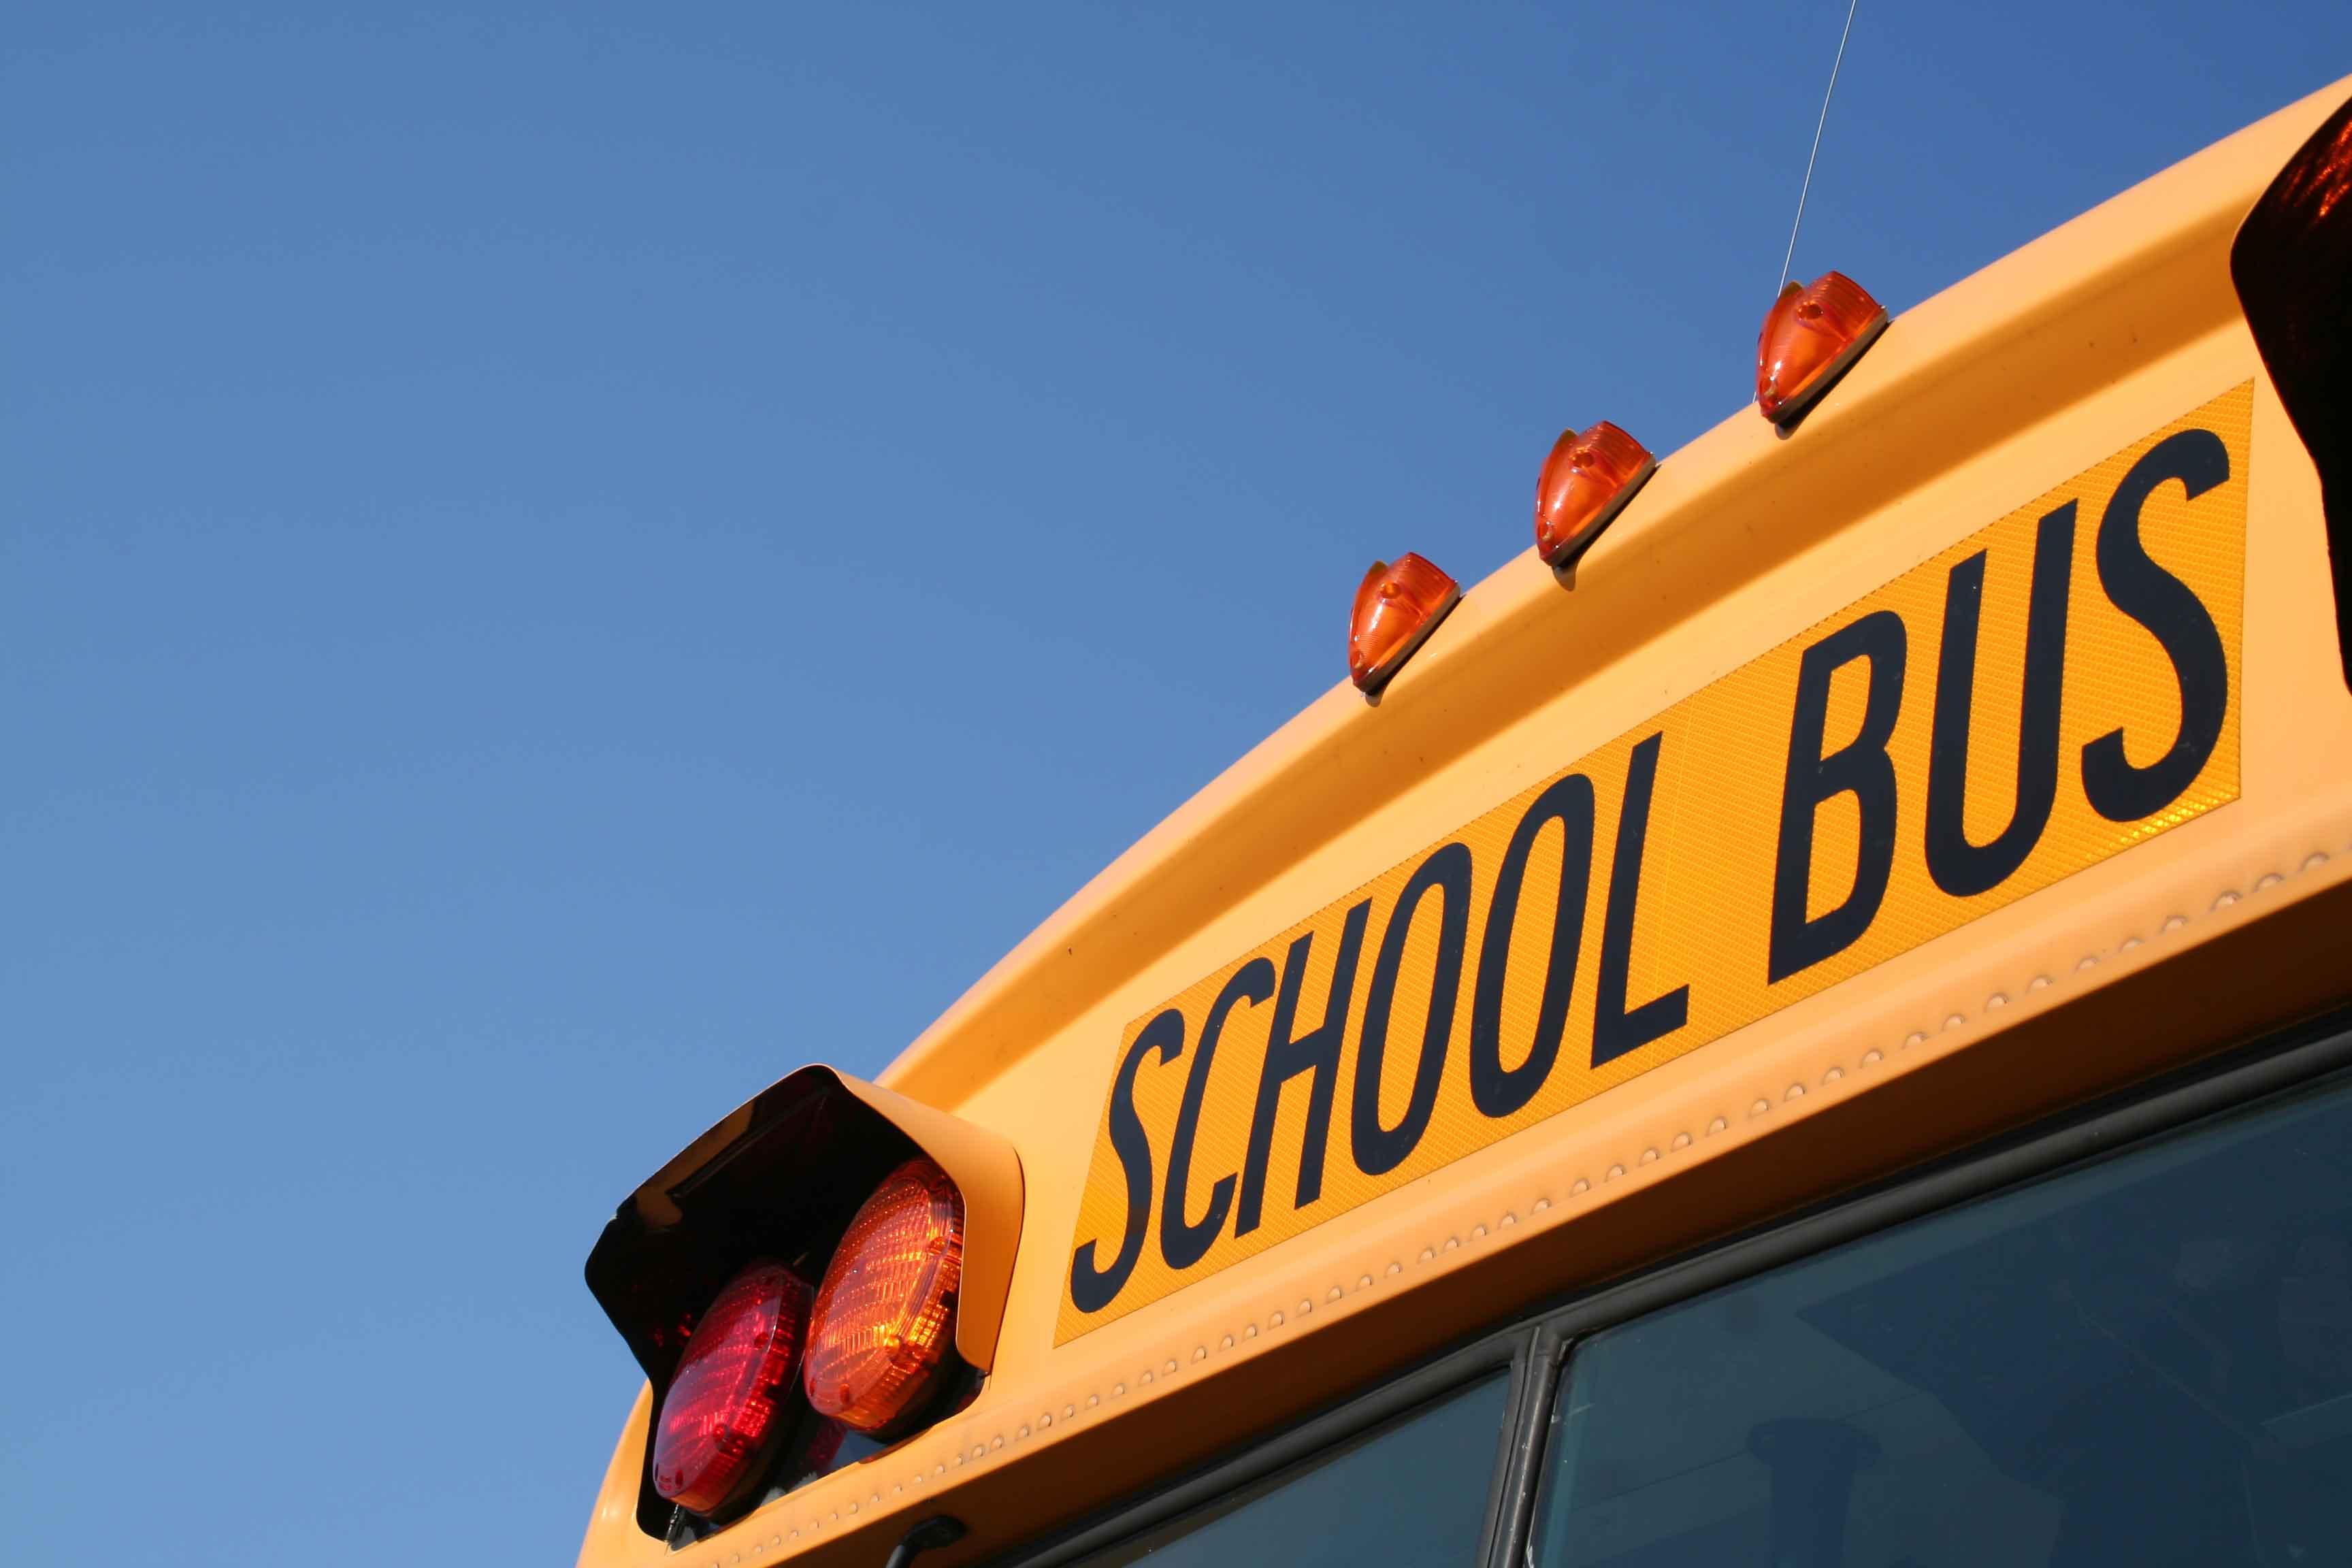 PROMO School - Yellow Bus Blue Sky - iStock - aceshot